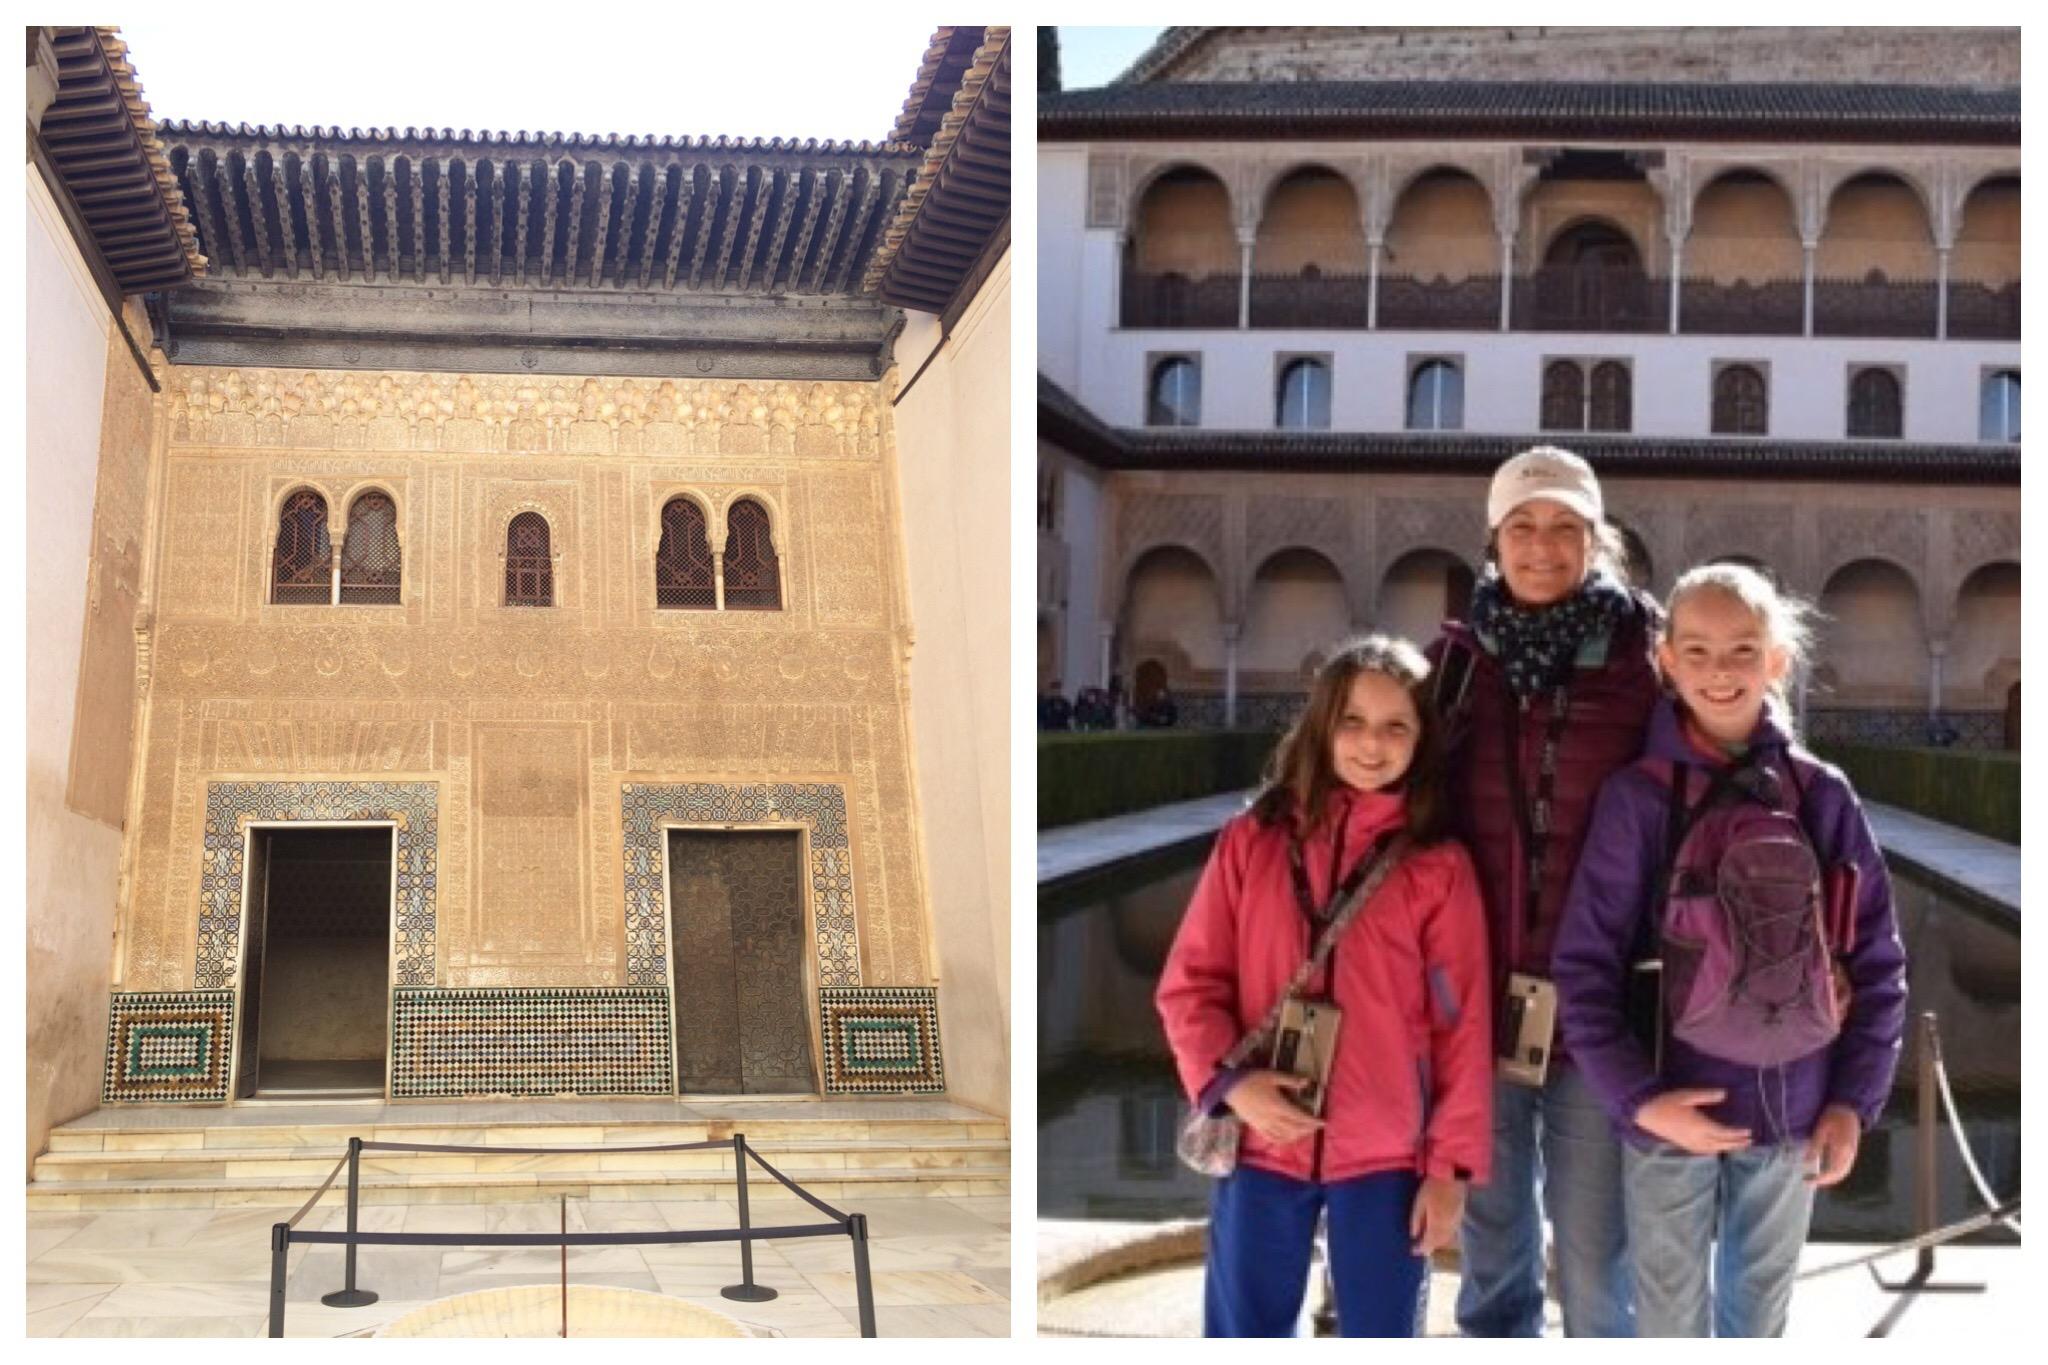 Alhambra Granada Spain - Nasrid Palaces